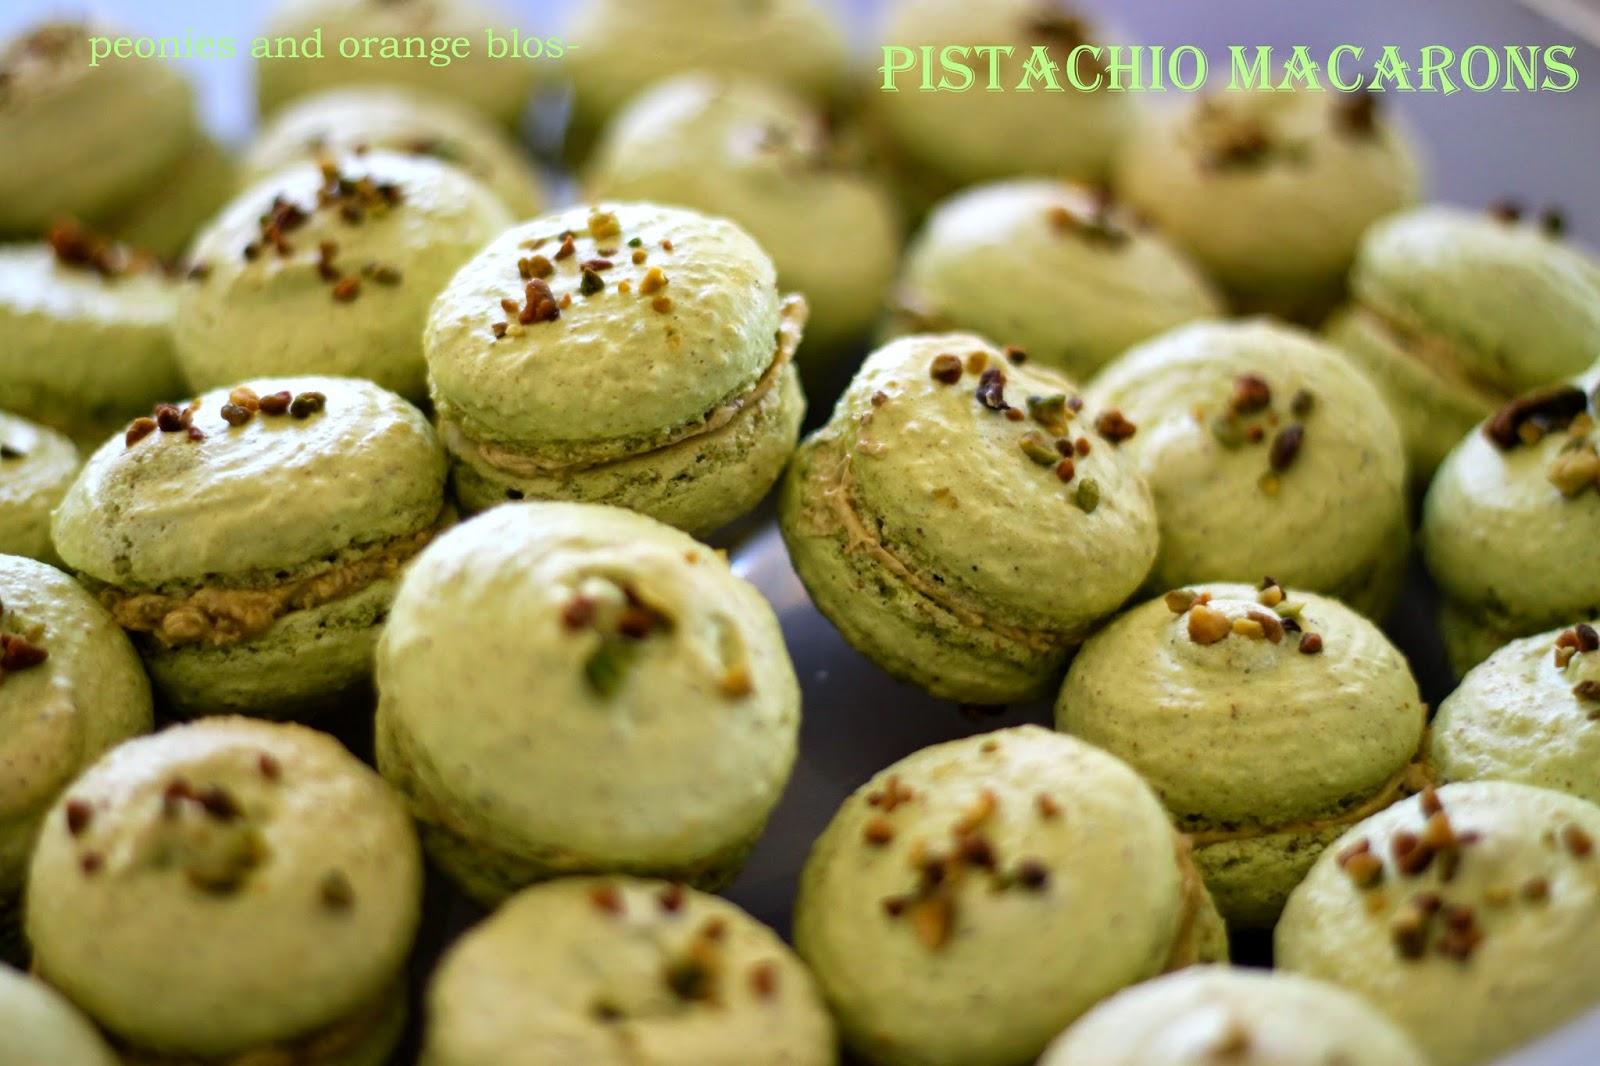 Pistachio Macarons!